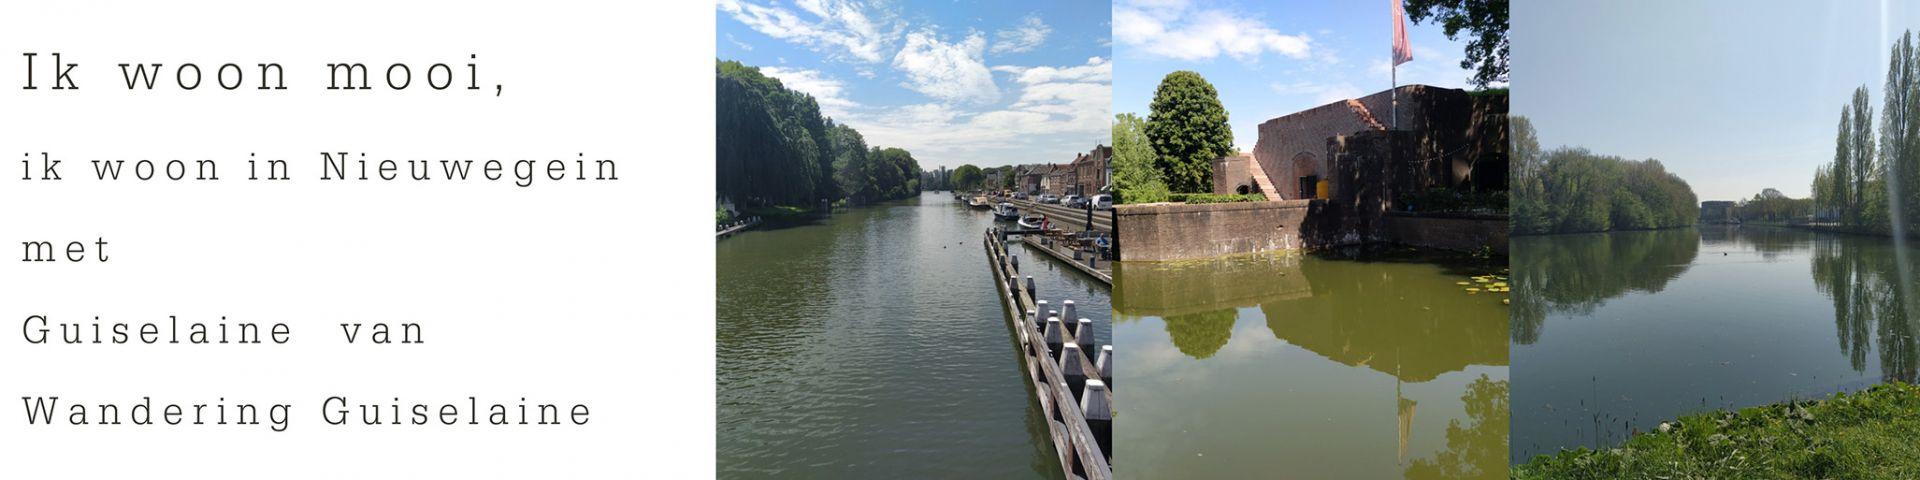 Ik woon mooi, ik woon in Nieuwegein – met Guiselaine